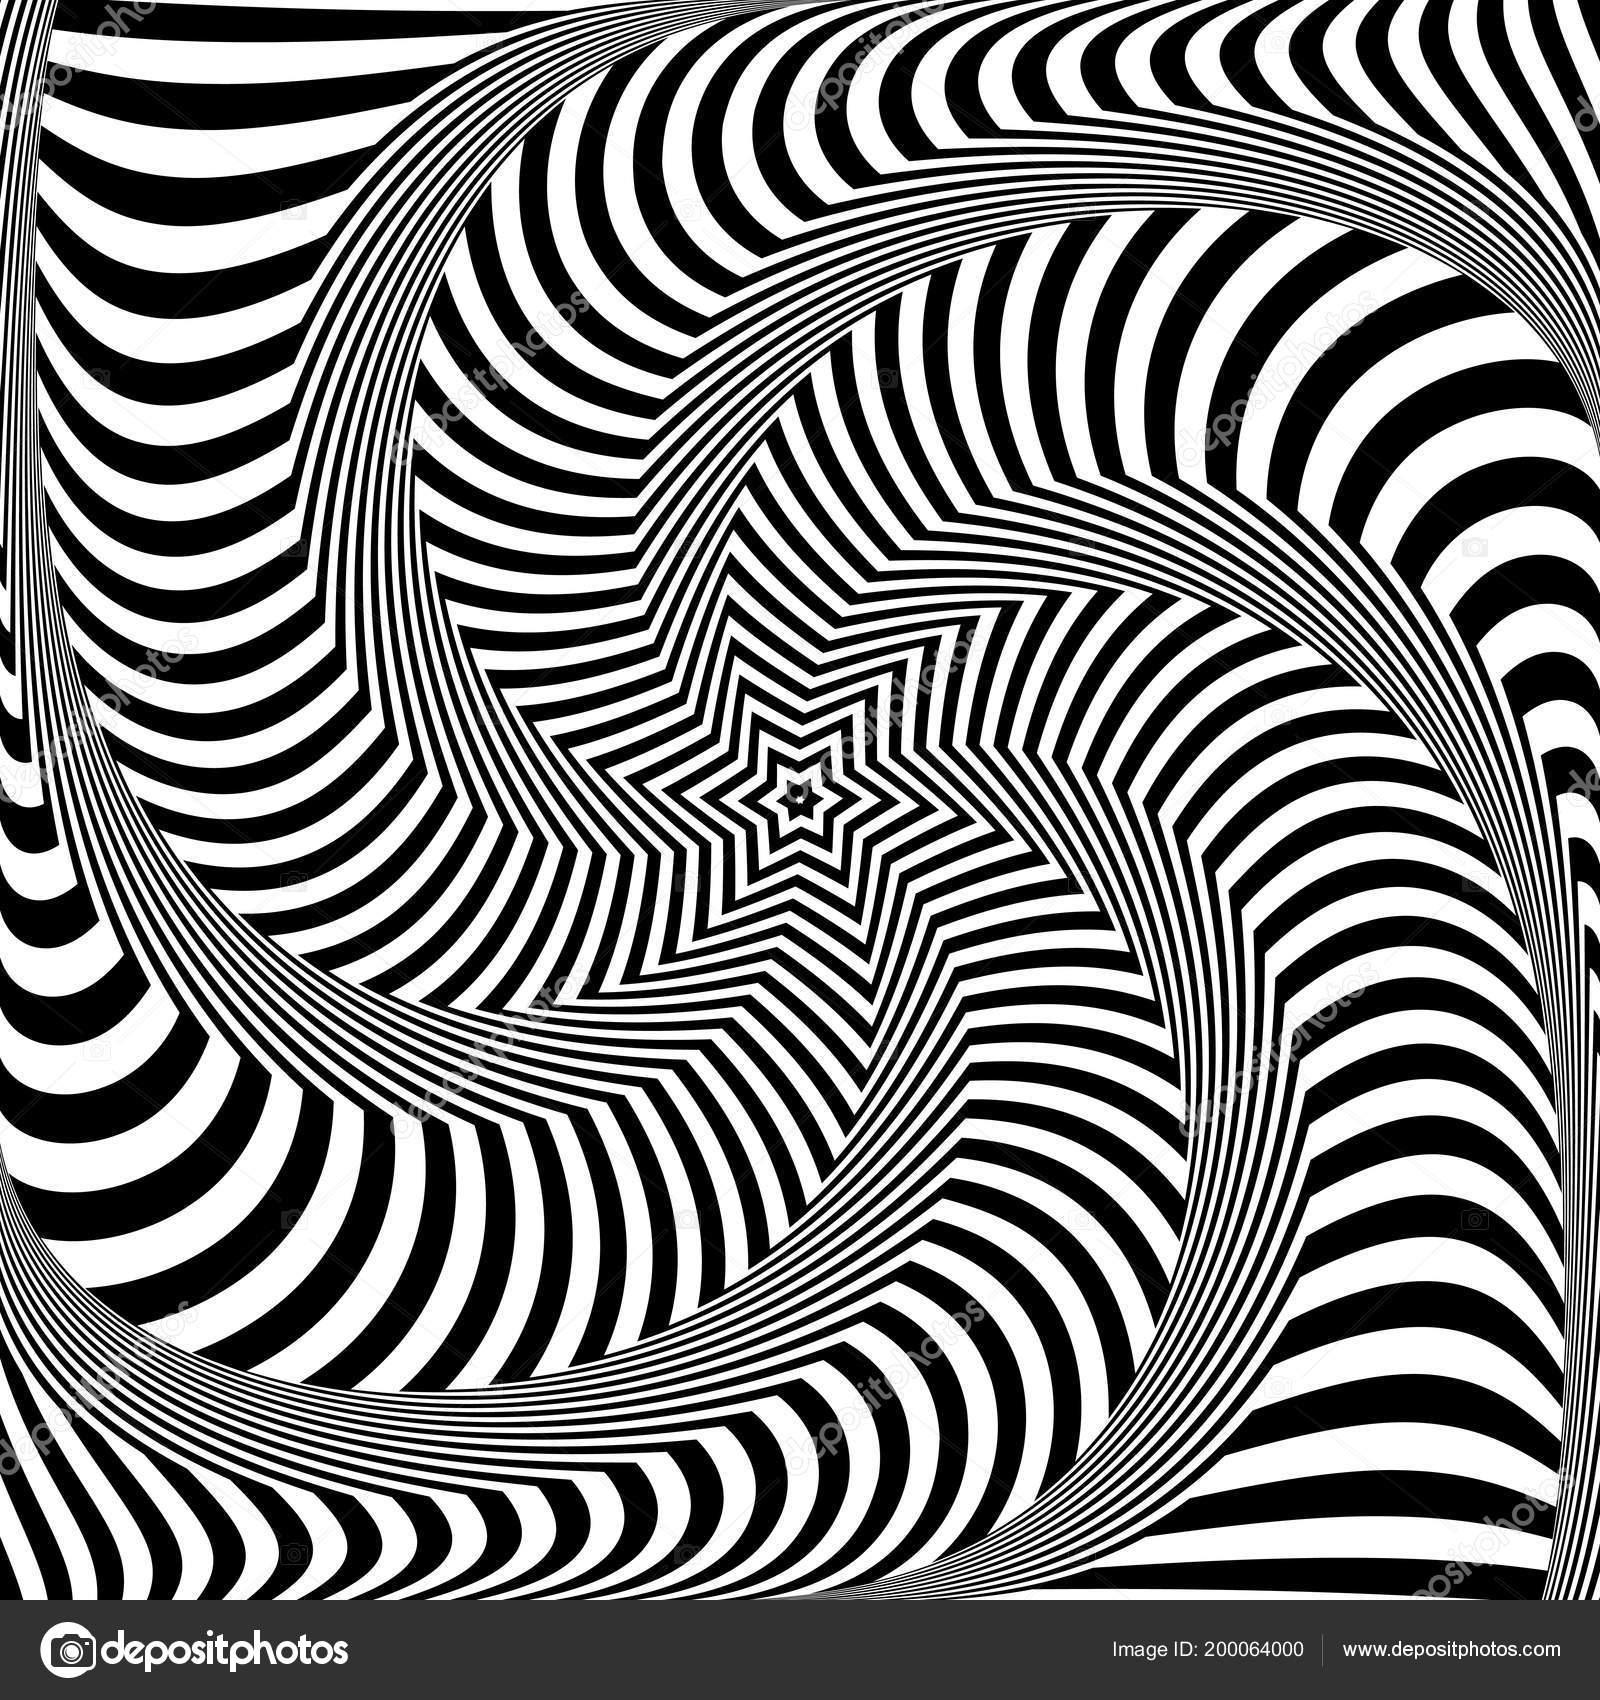 Abstract Art Design Lines Texture Vector Illustration